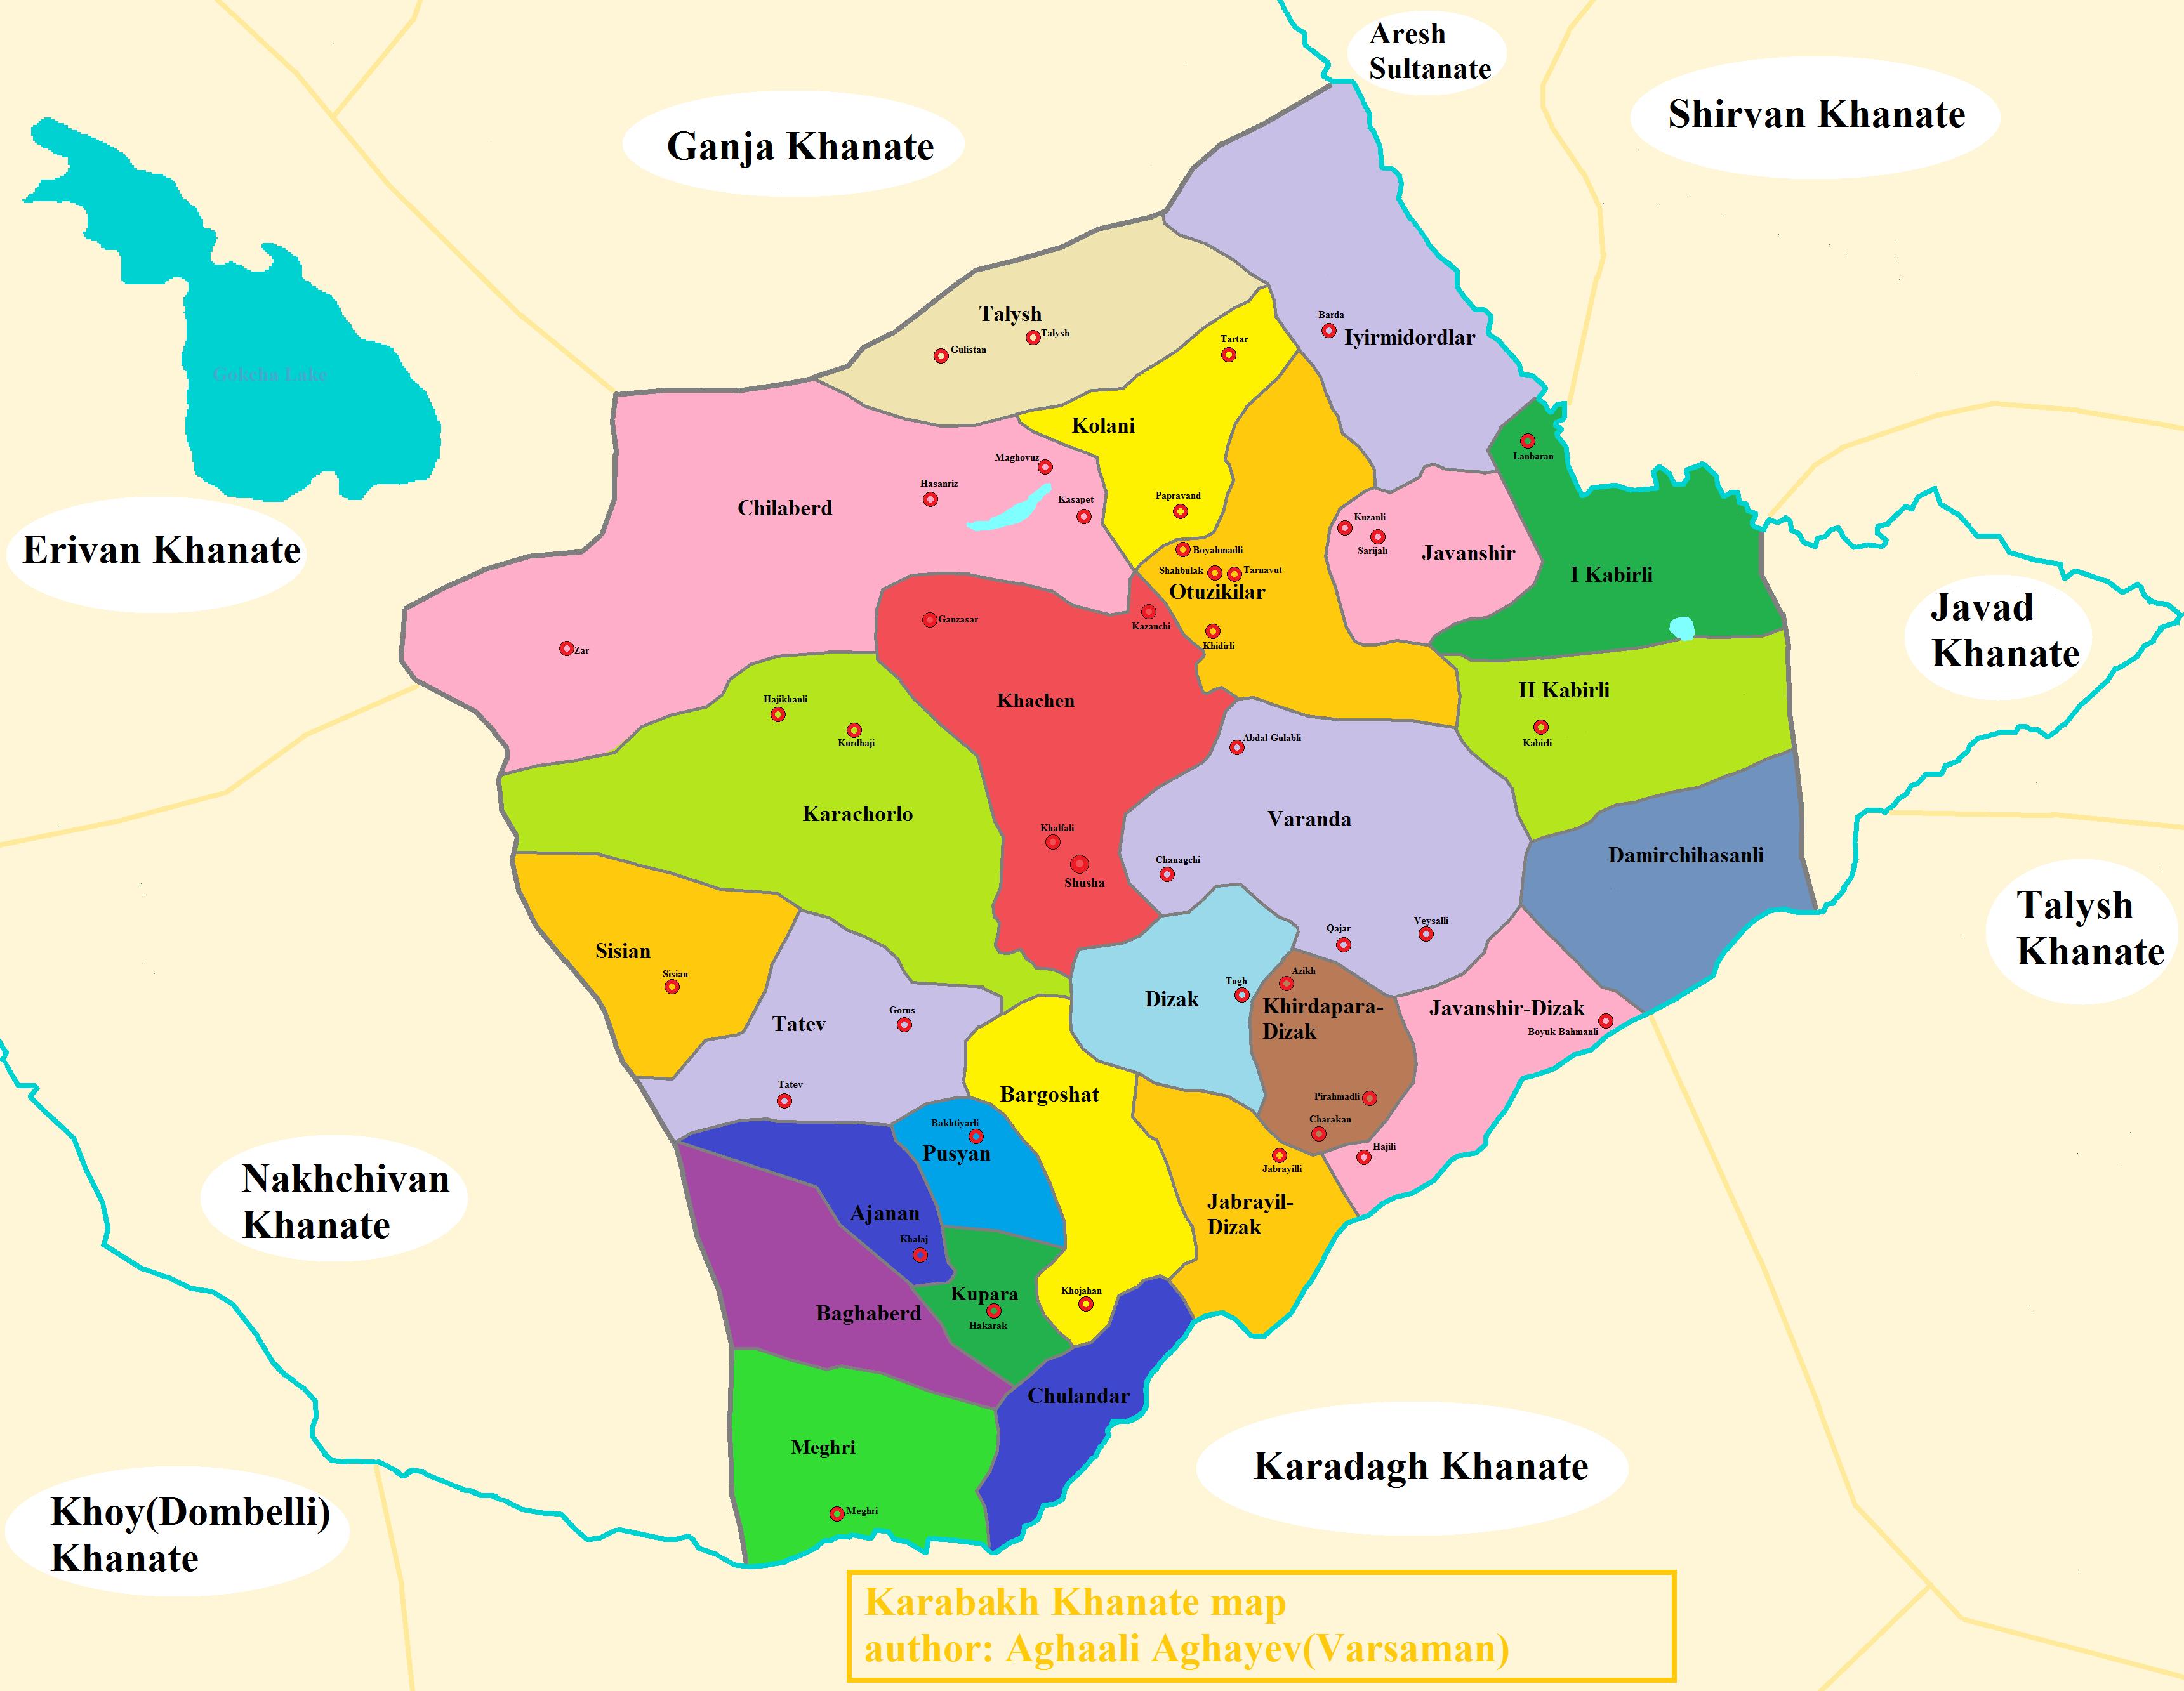 Karabakh_khanate(Qaraba%C4%9F_xanl%C4%B1